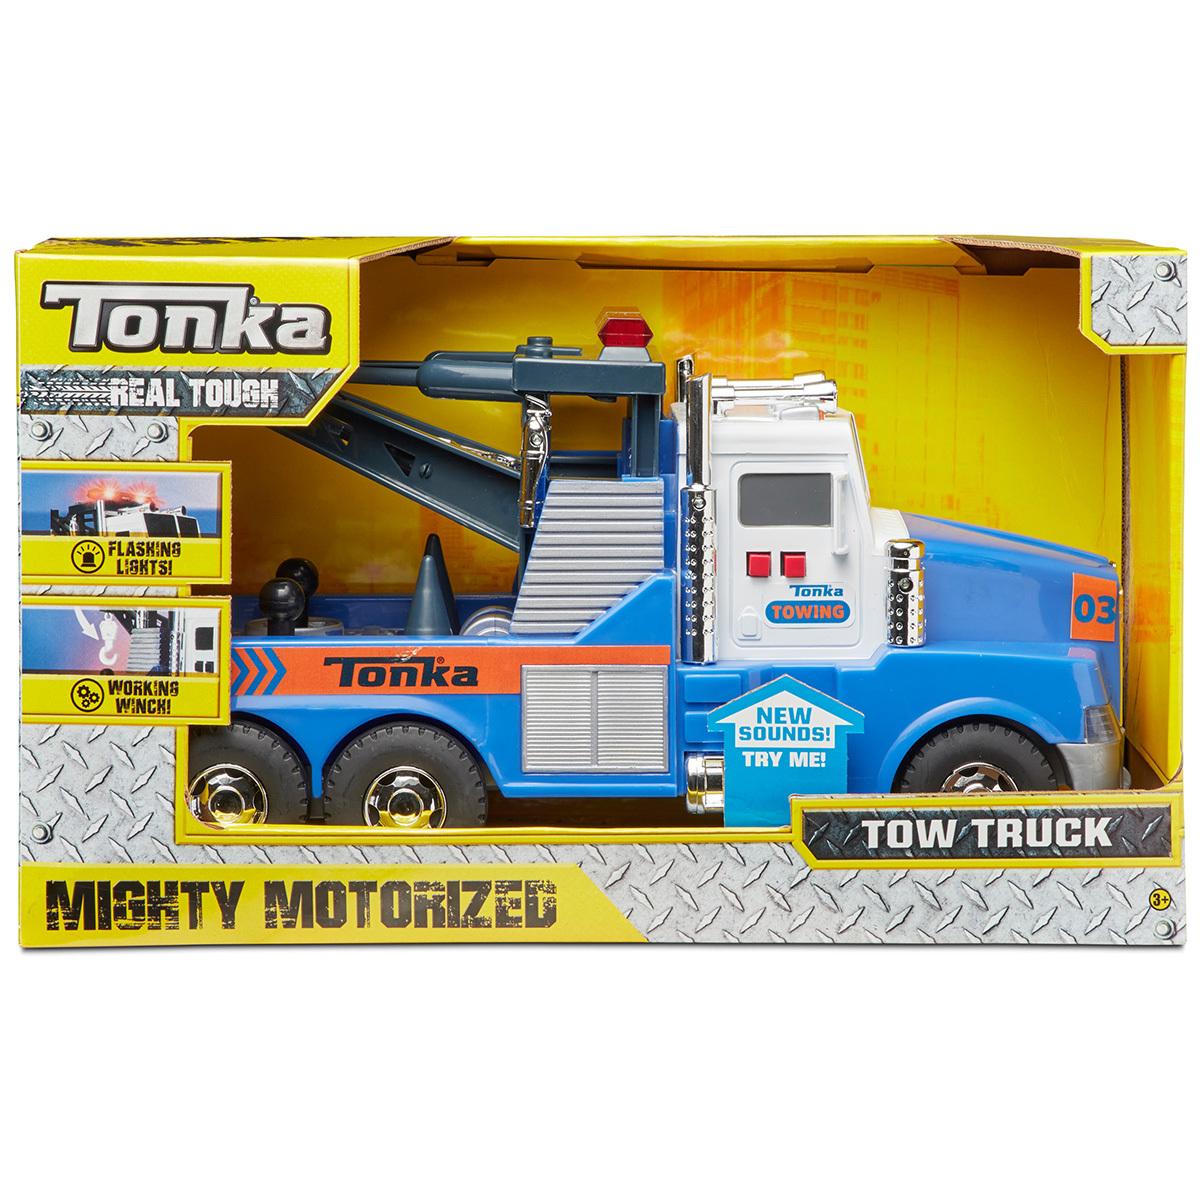 Tonka Mighty Motorised Vehicle Tow Truck Costco Australia